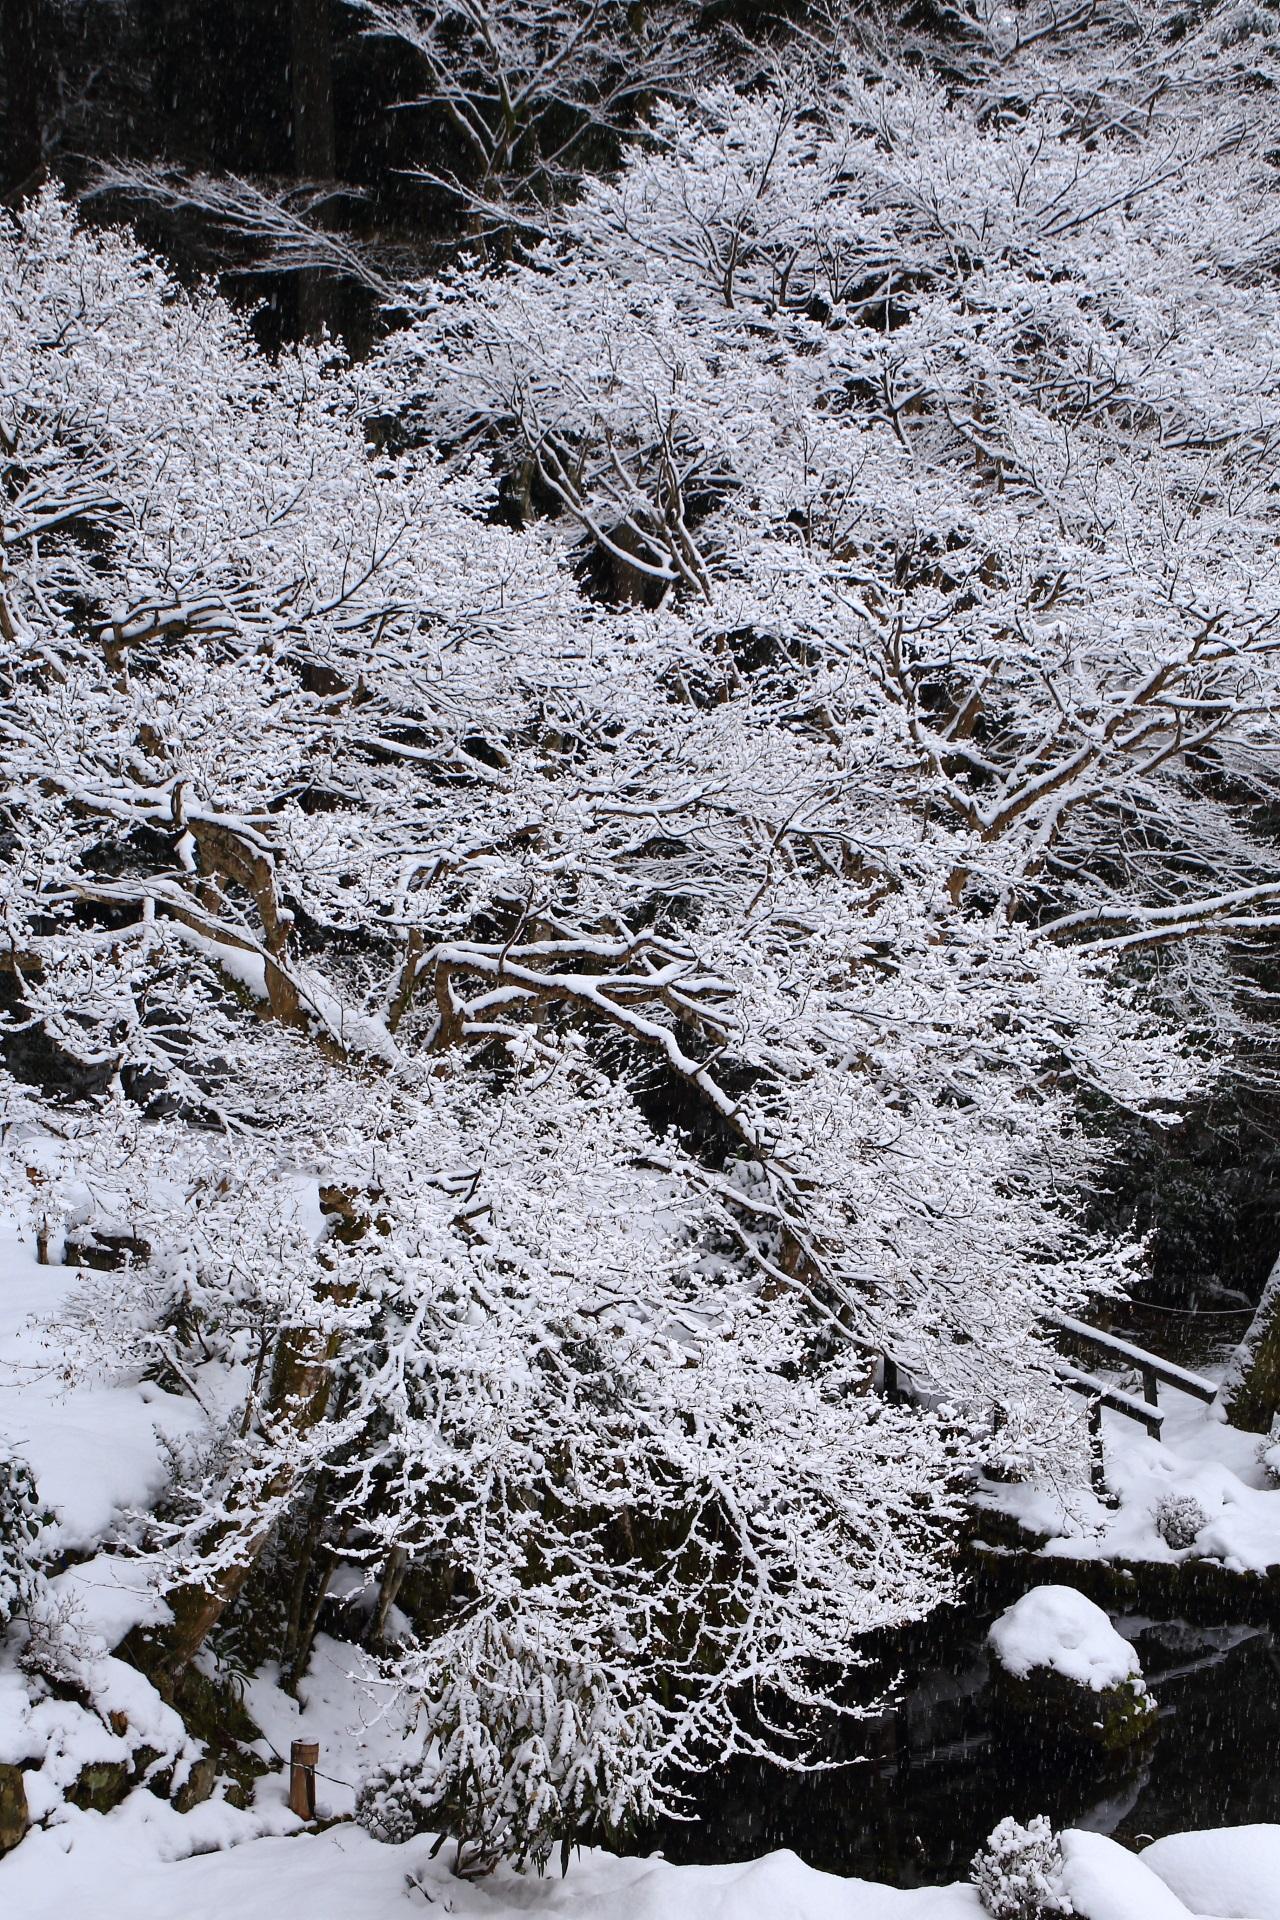 Kyoto Ohara Syorin-in Temple snowy landscape